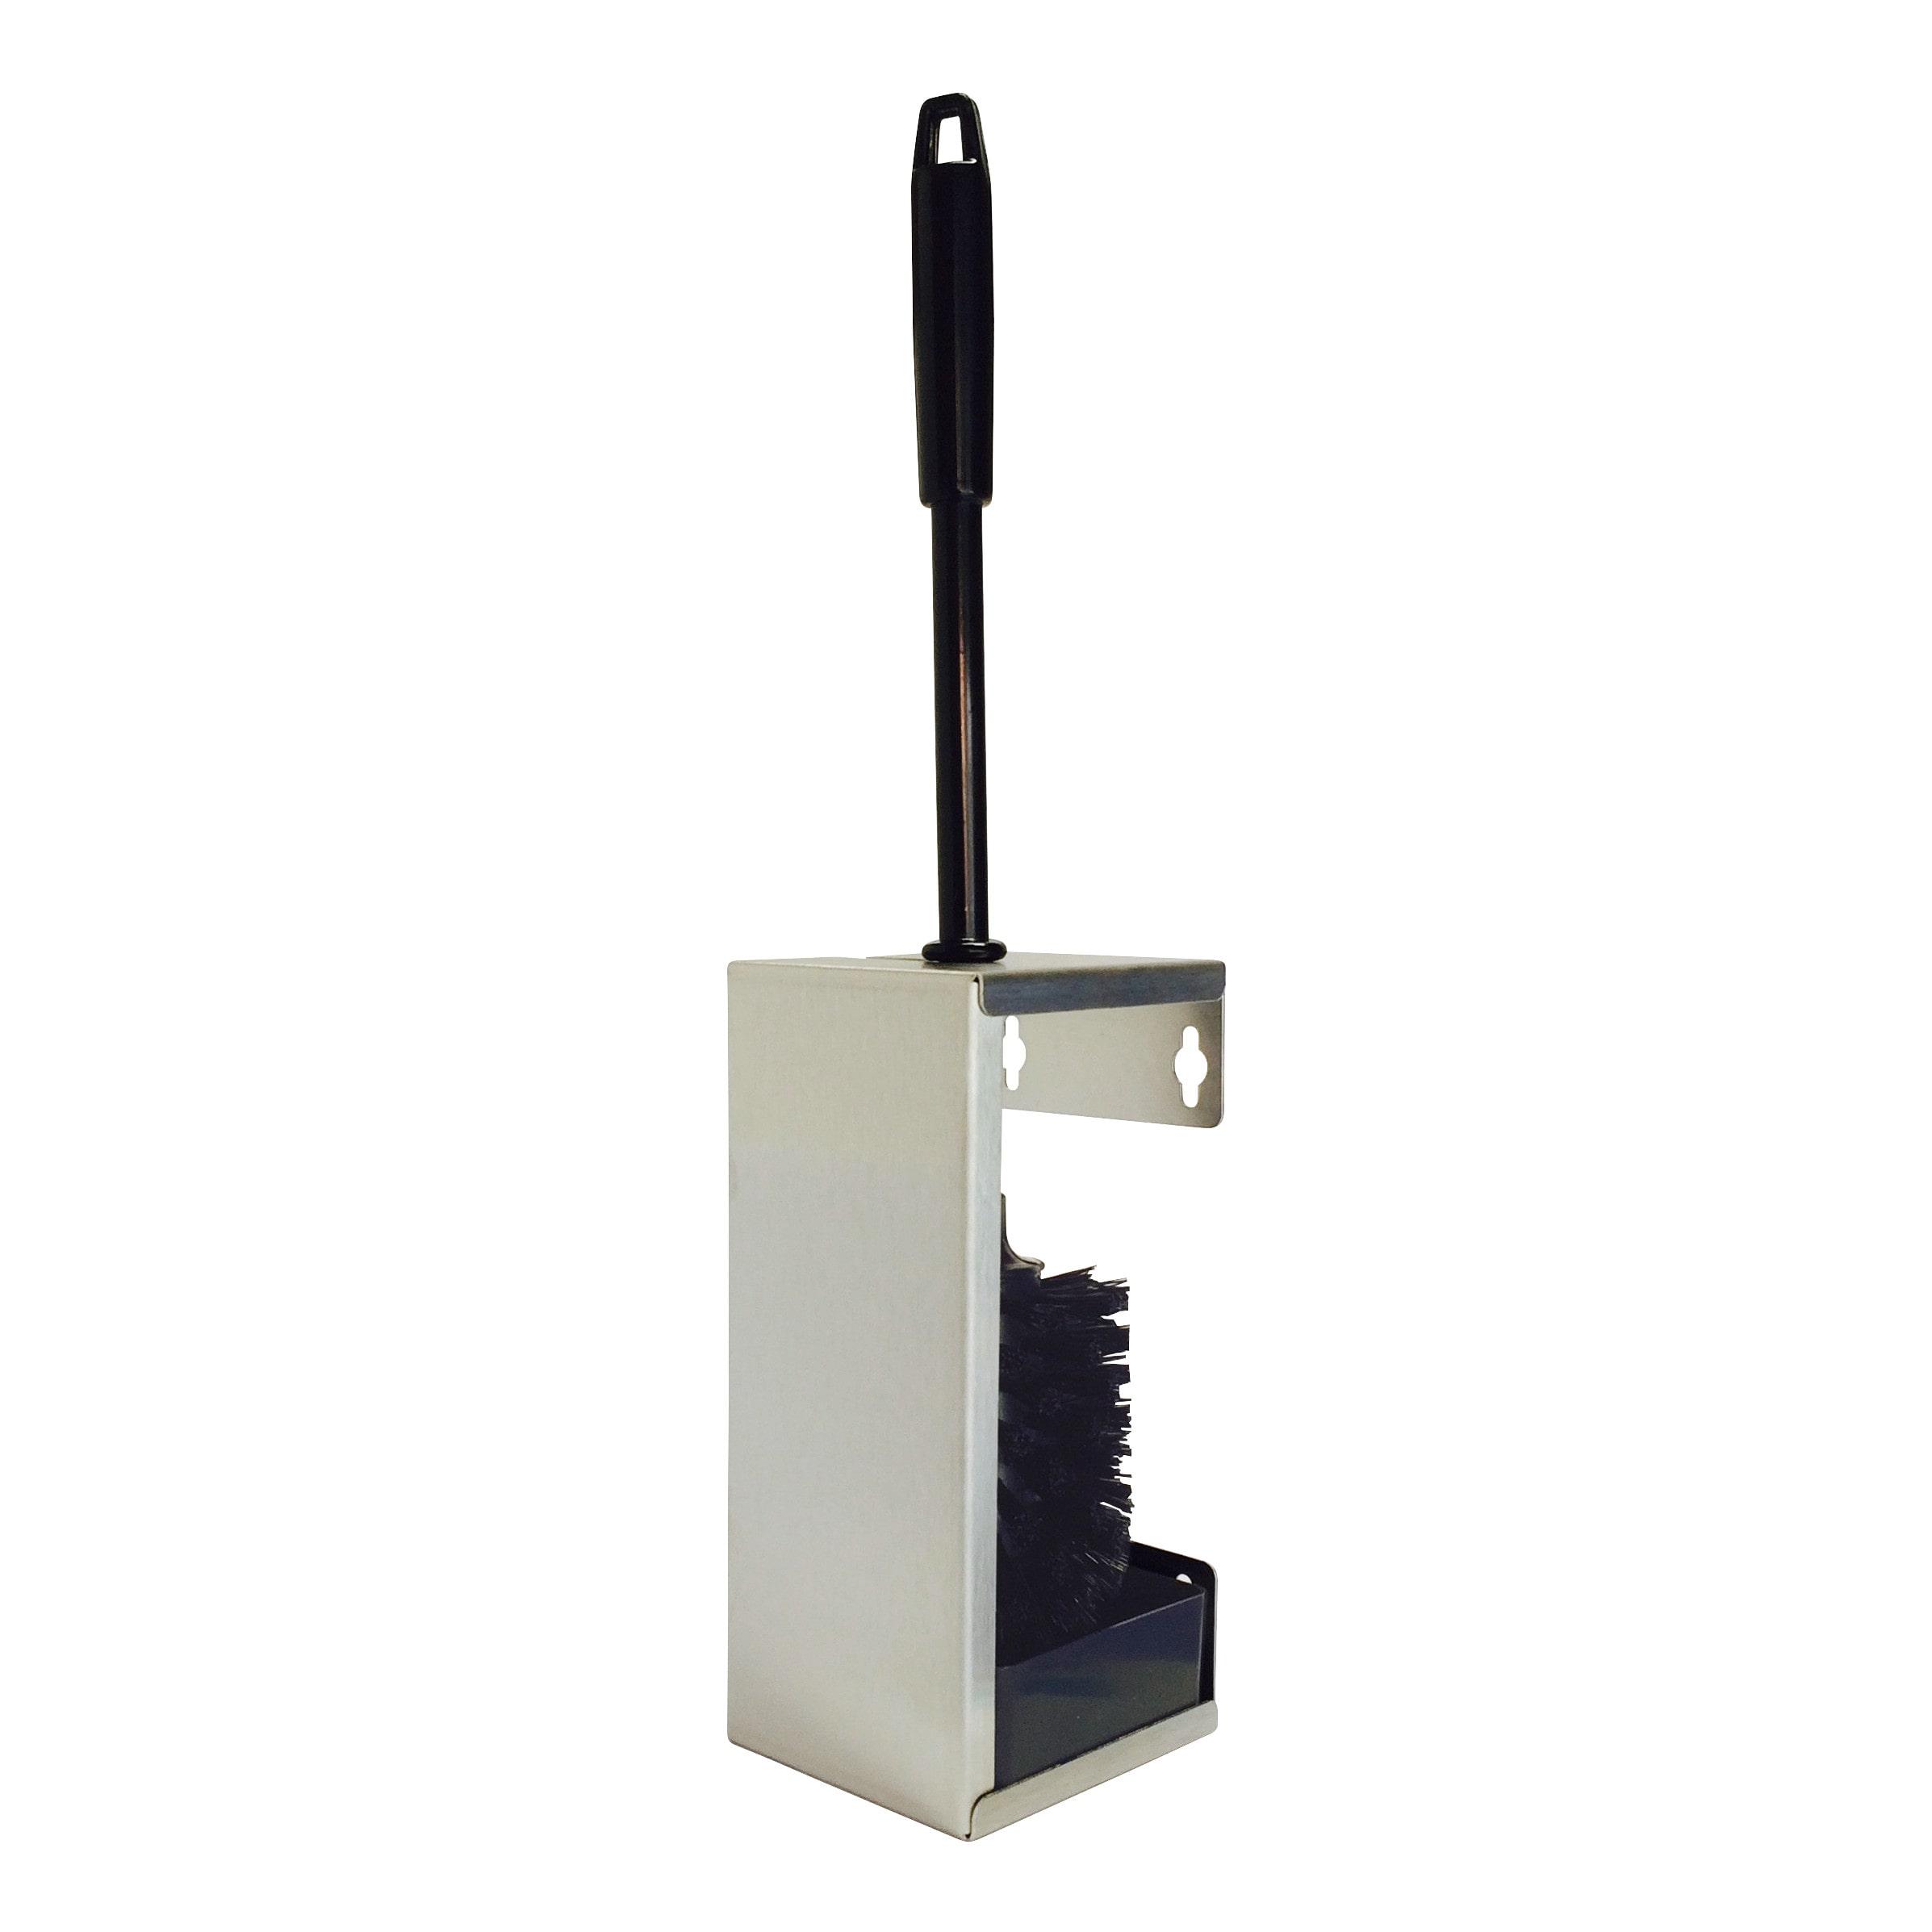 Santral Toiletborstelhouder RVS